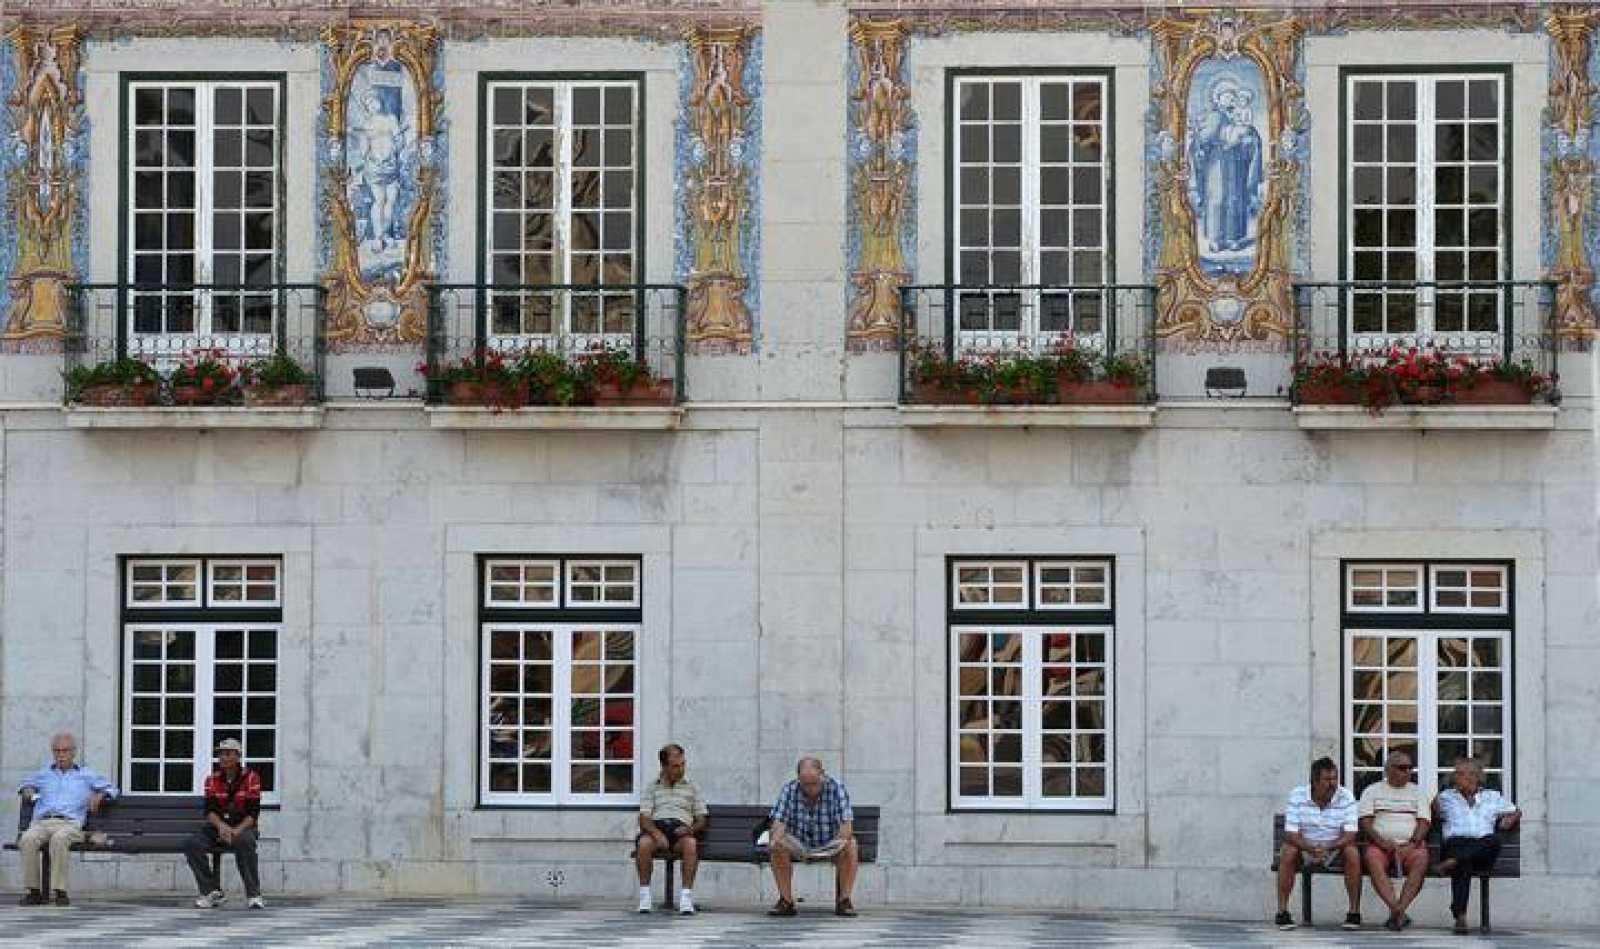 Jubilados en una plaza de Lisboa